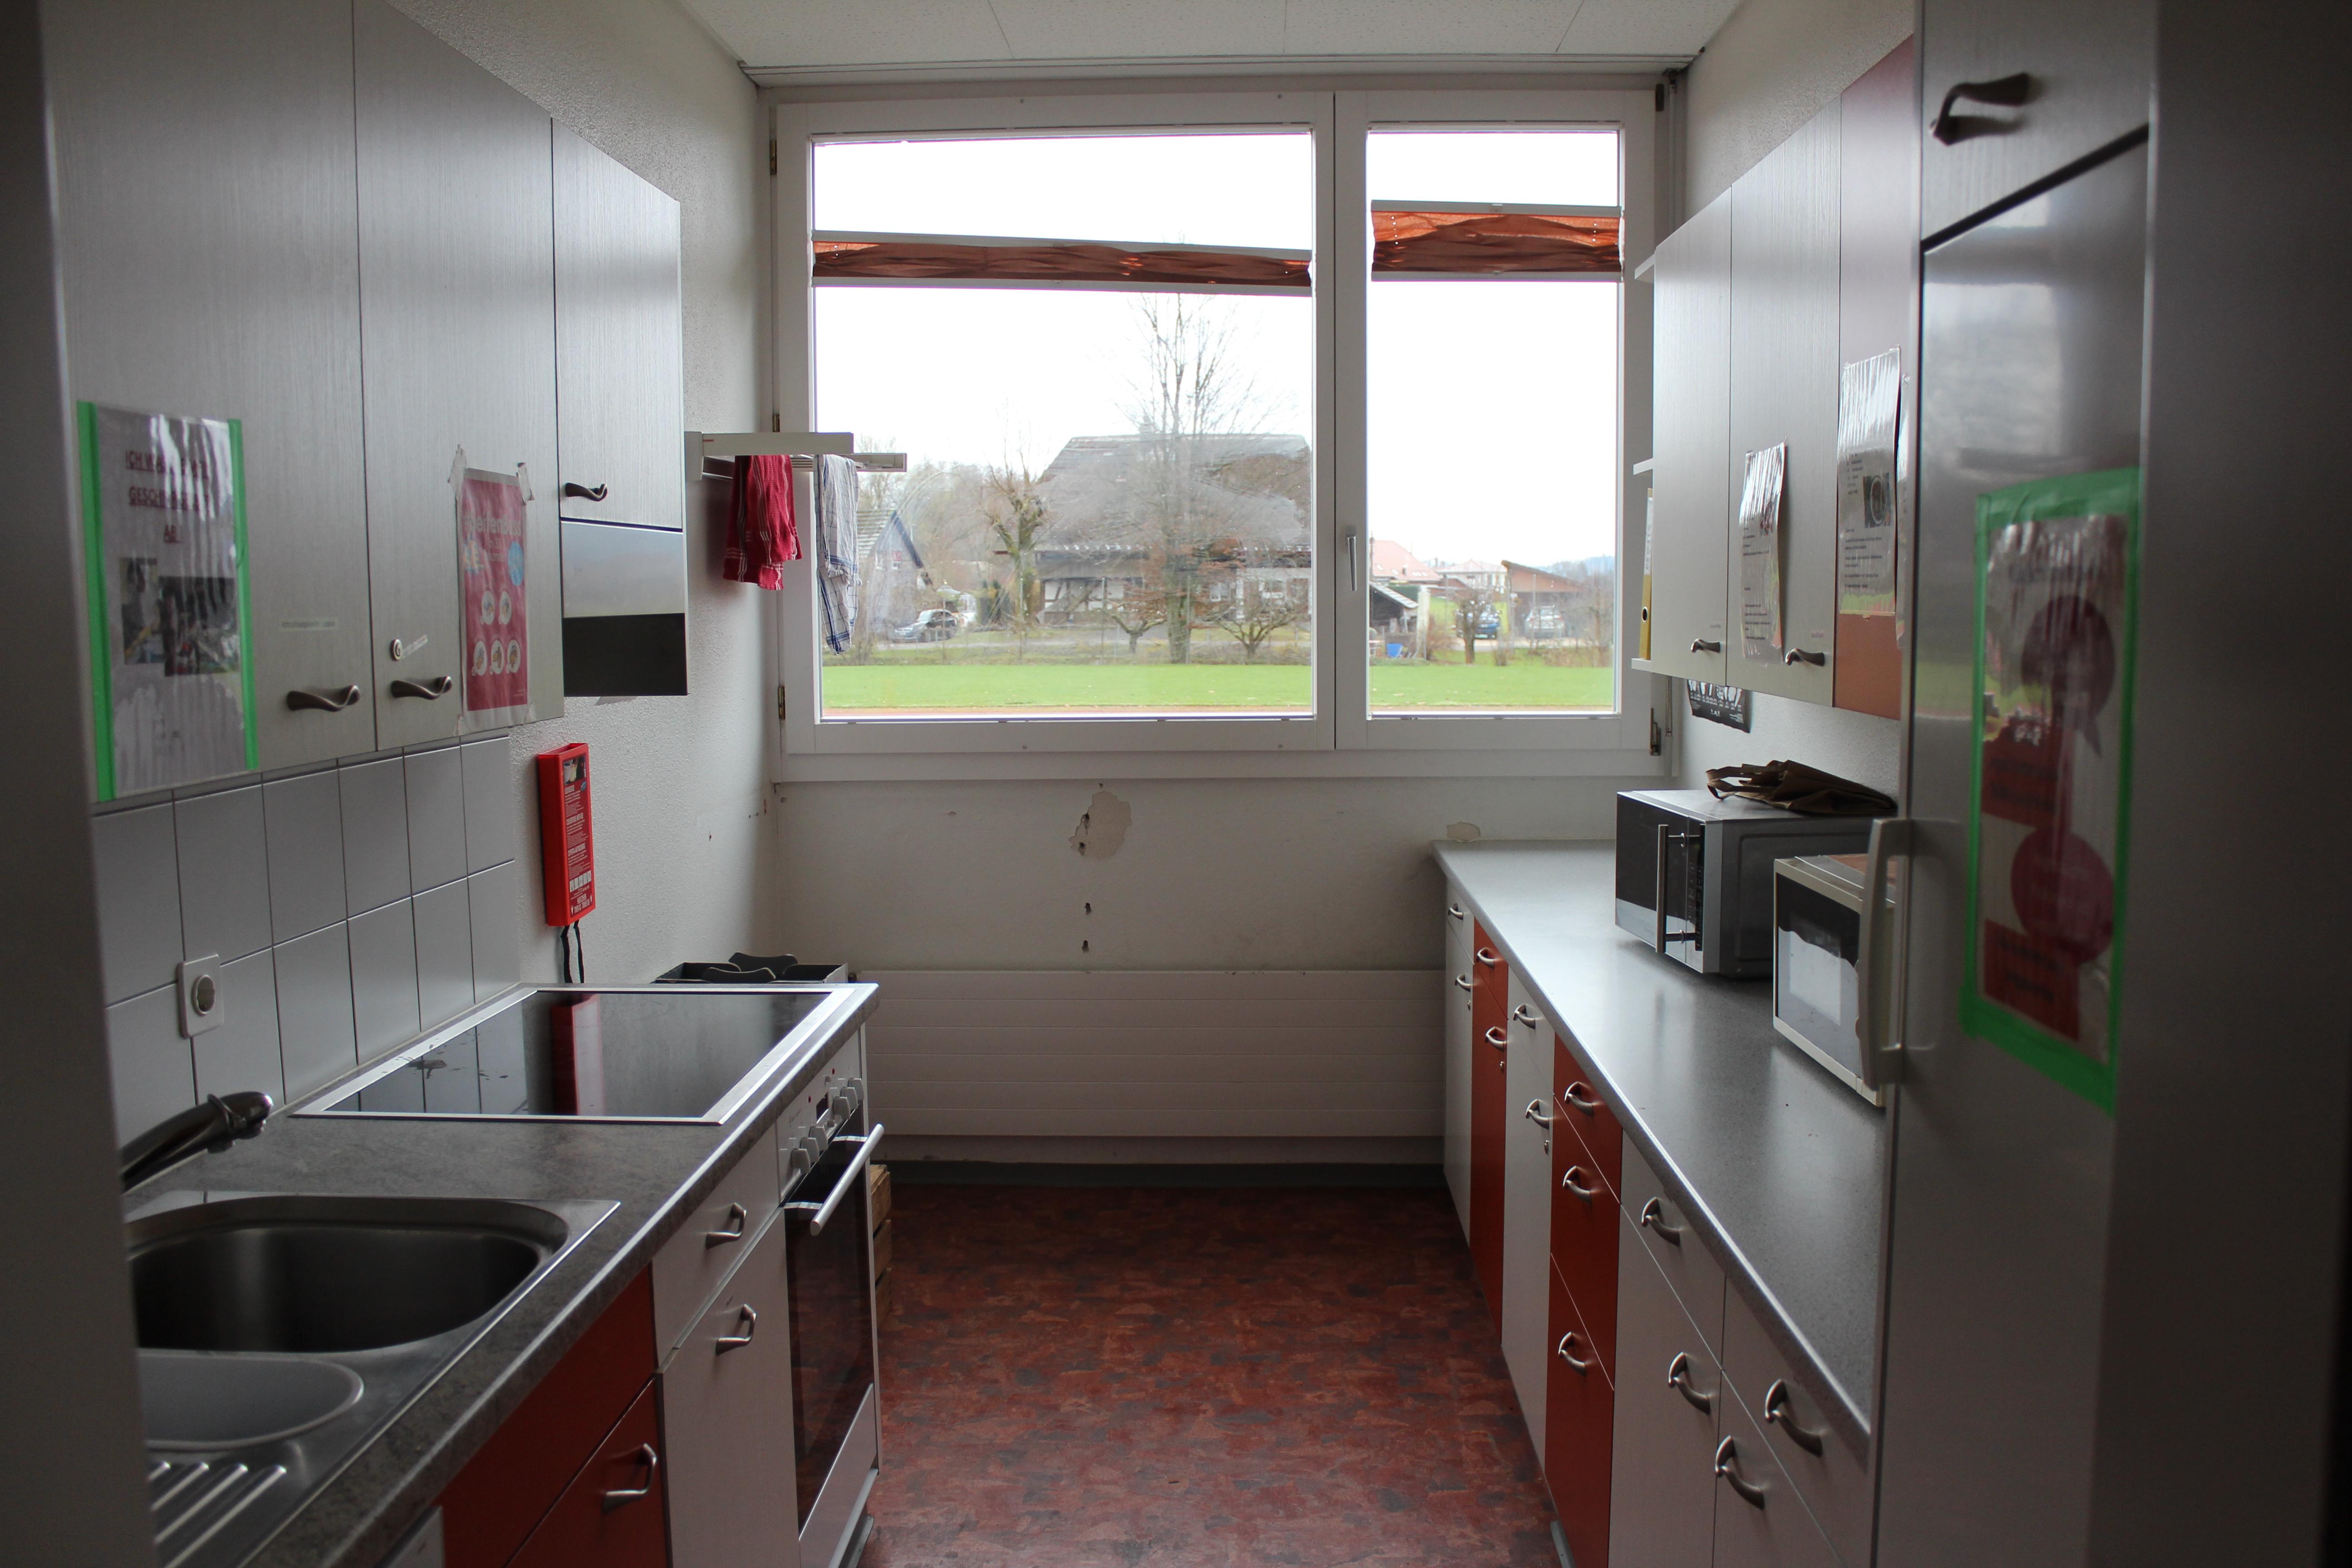 201210_Küche.JPG